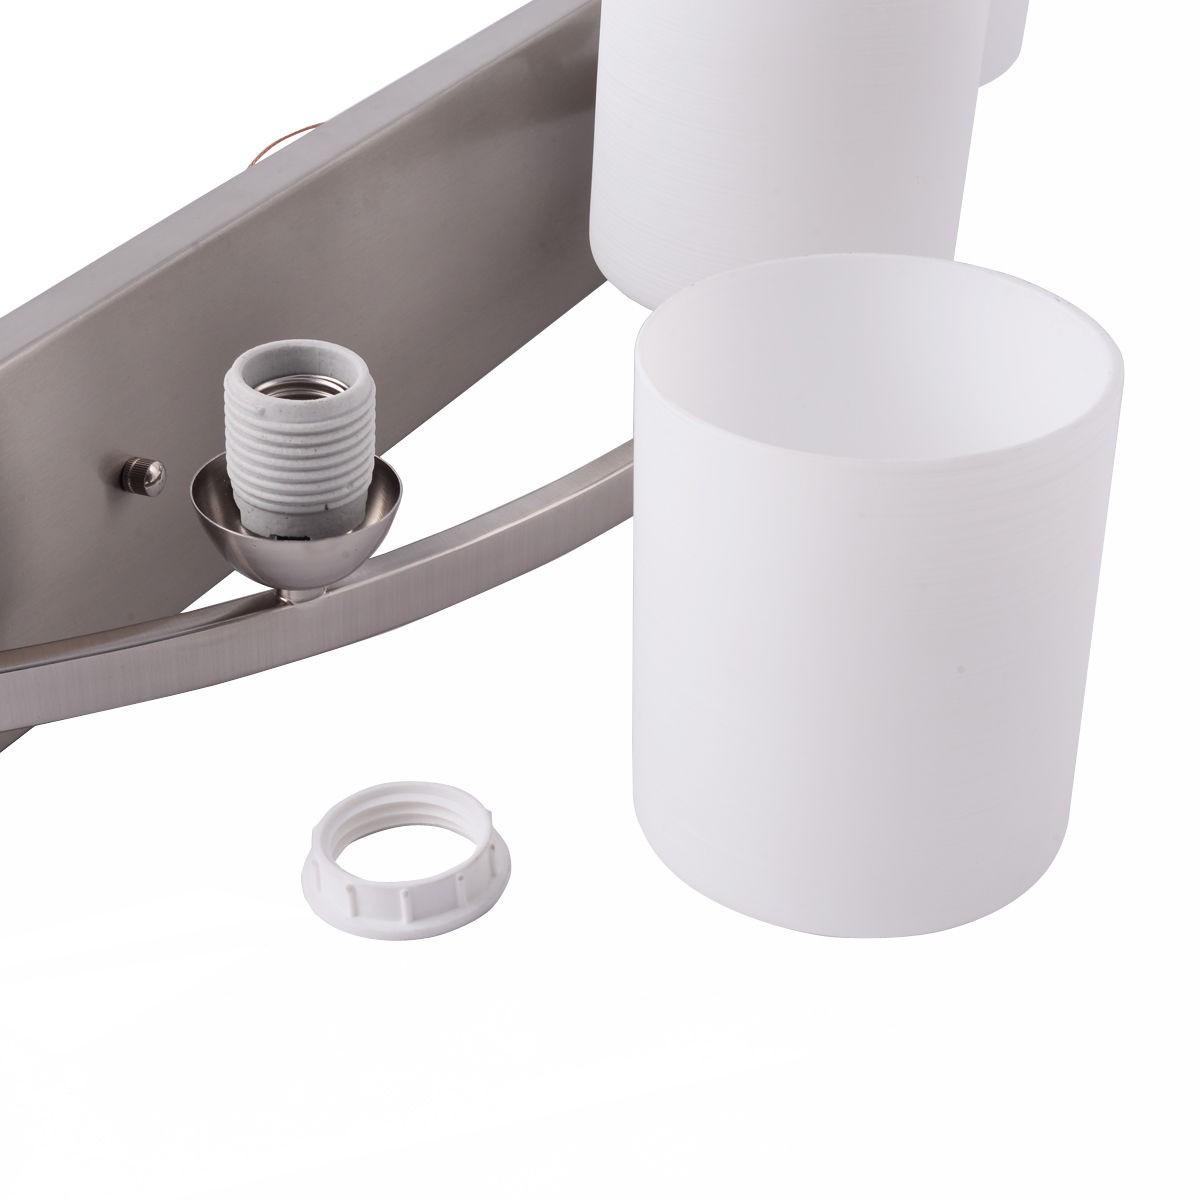 Bathroom Vanity Lights Too Hot : 3 Light Glass Wall Sconce Lampshade Pendant Fixture Vanity Metal Bathroom Hot